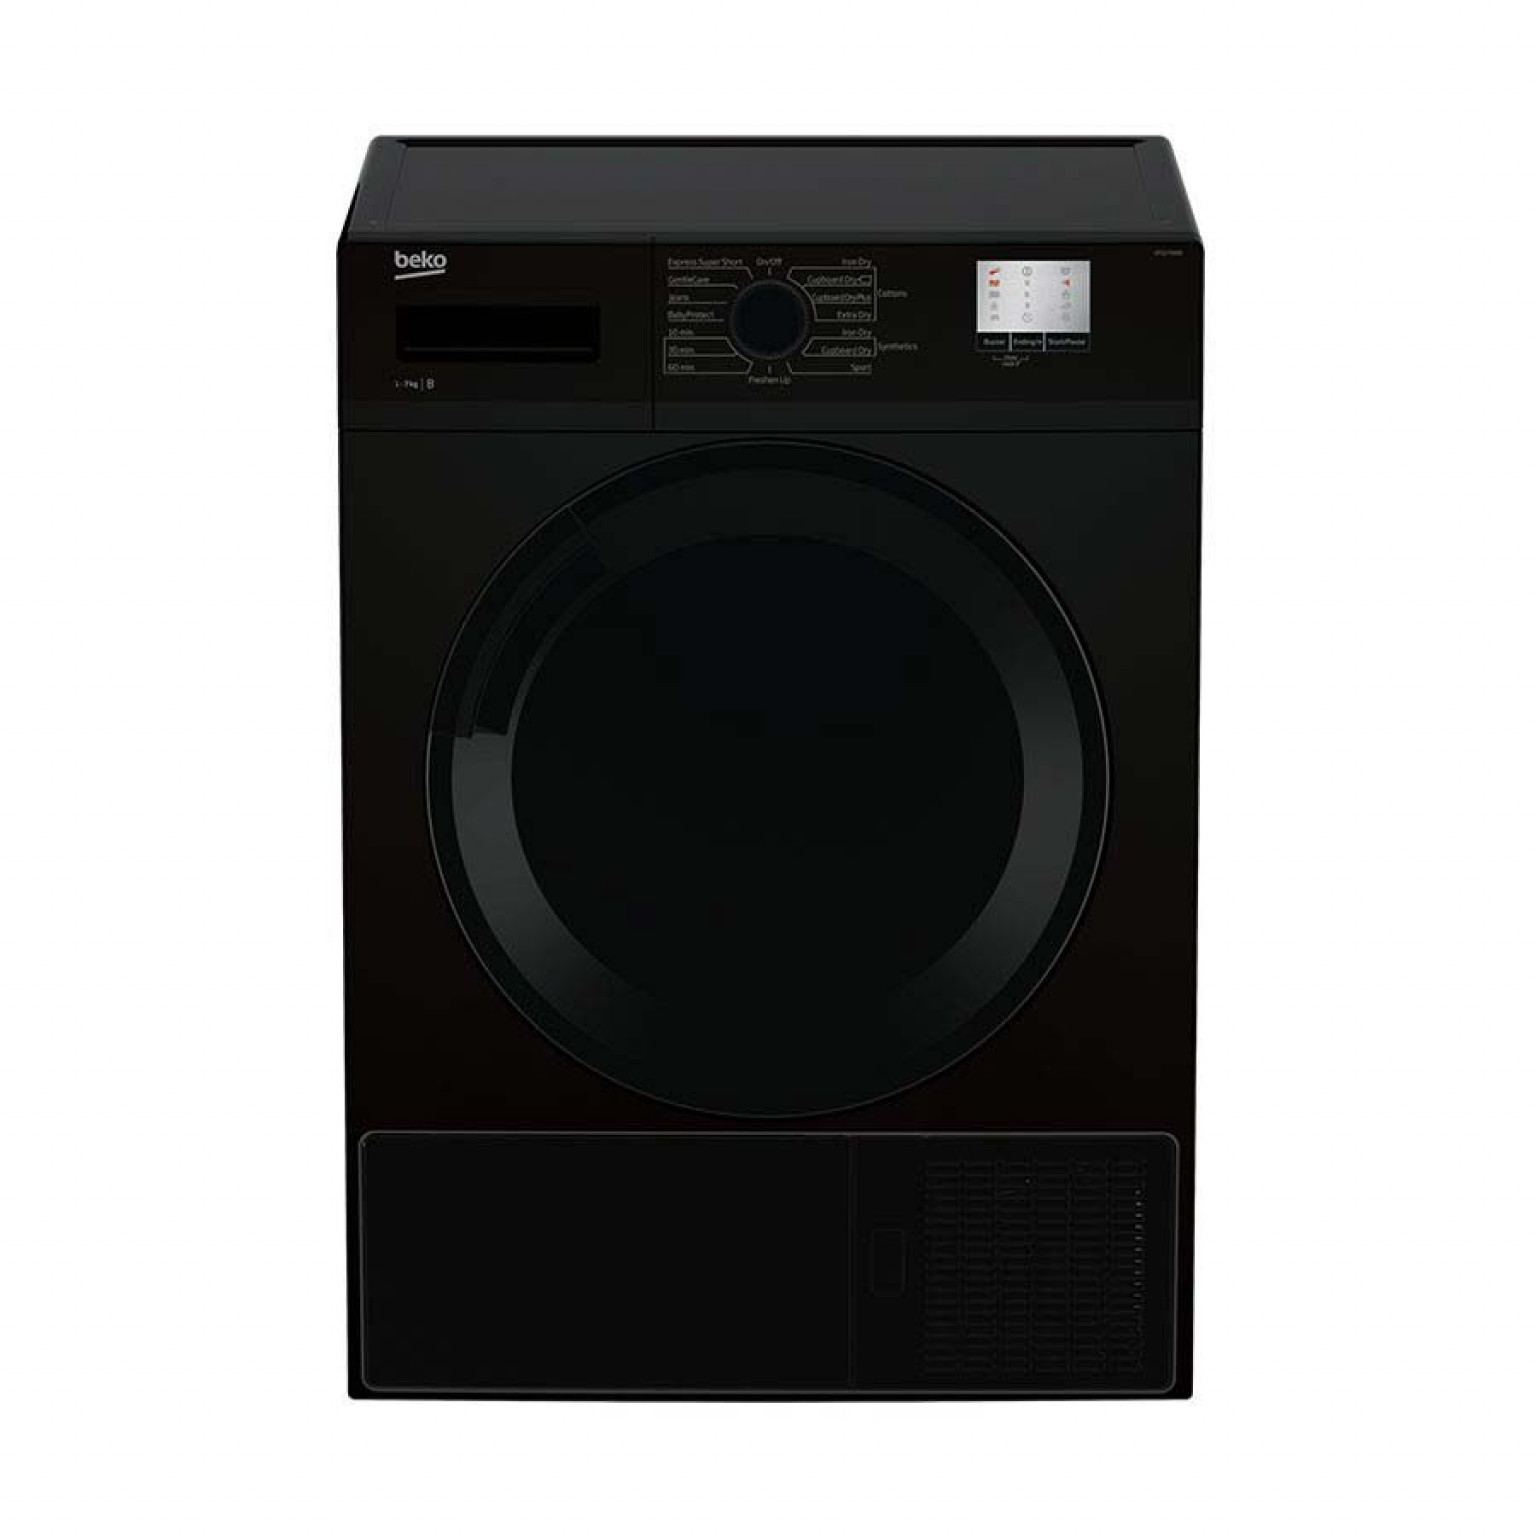 Beko EcoSmart 7Kg Condenser Dryer | DTGC7000B